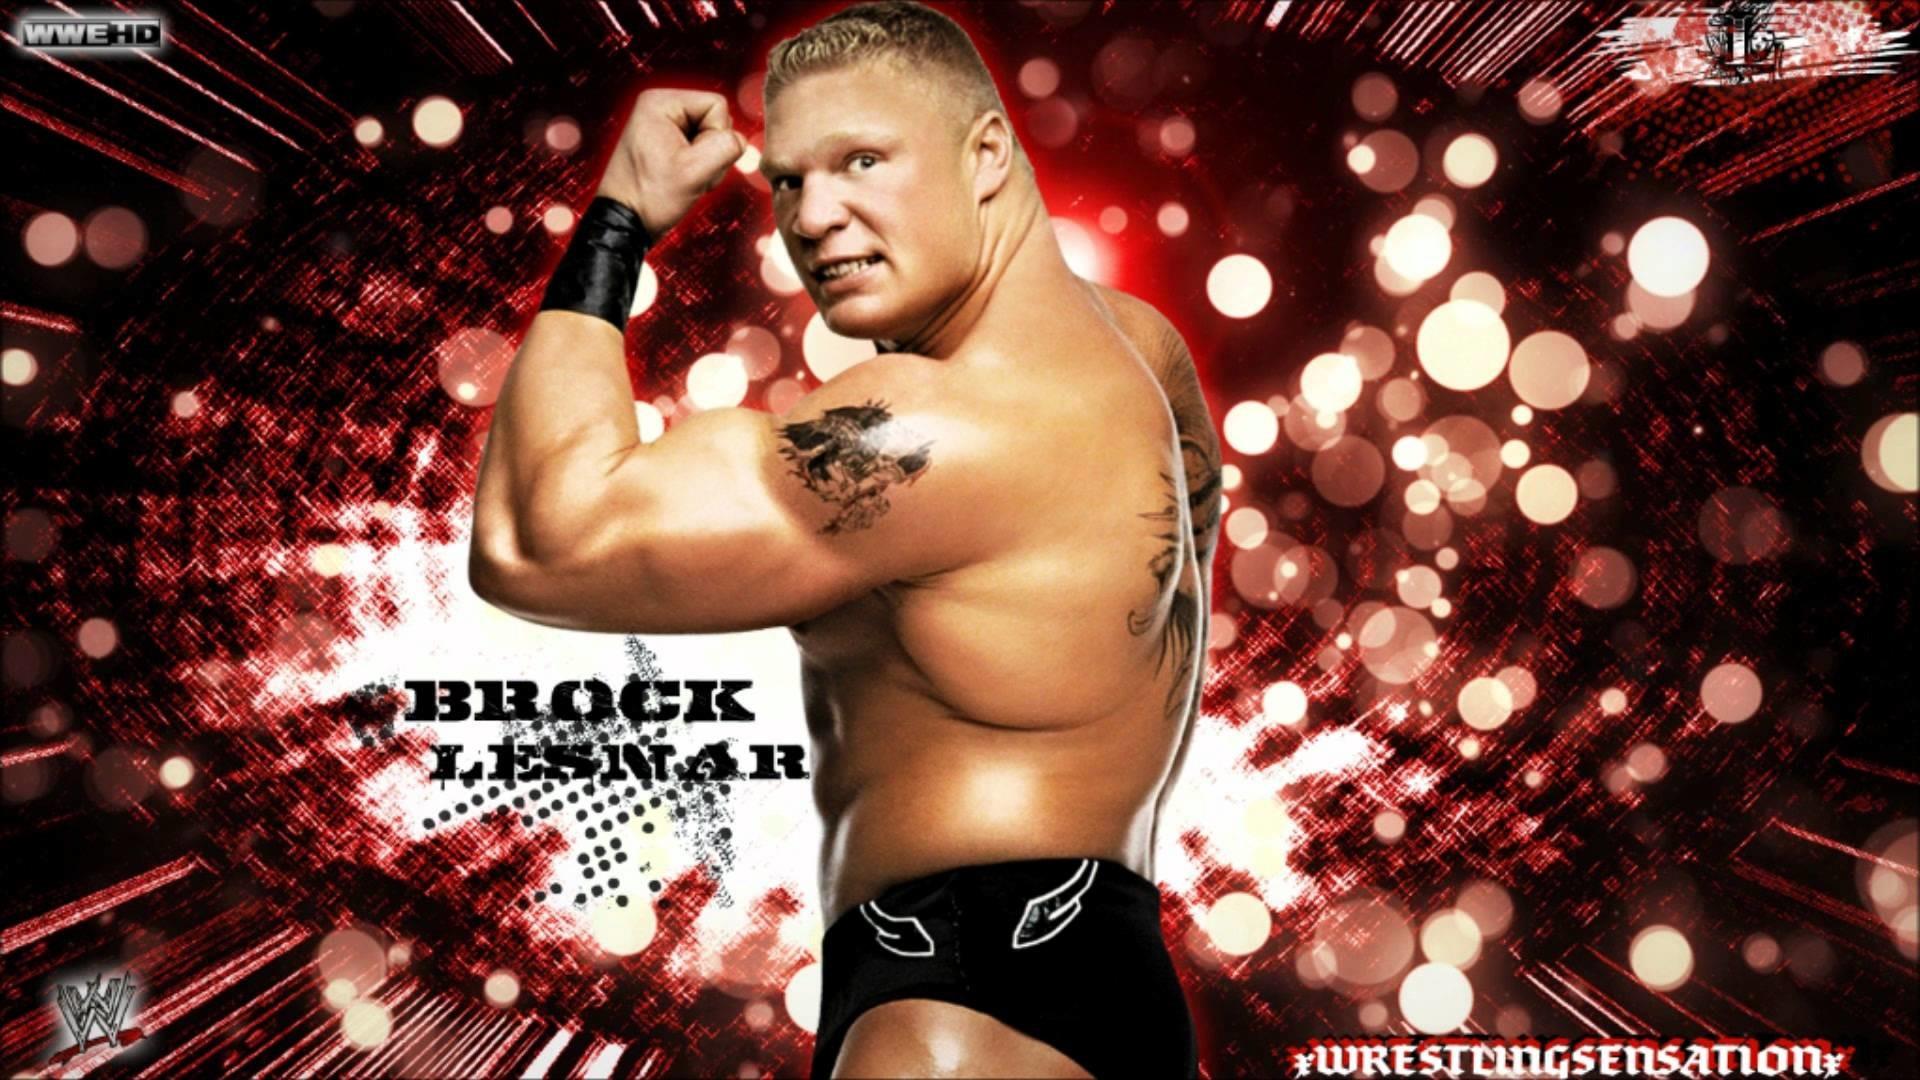 TagsWWE Brock Lesnar Here Comes The Pain BlurayWWE 2003 BluraycomWWE YouTubeMatch